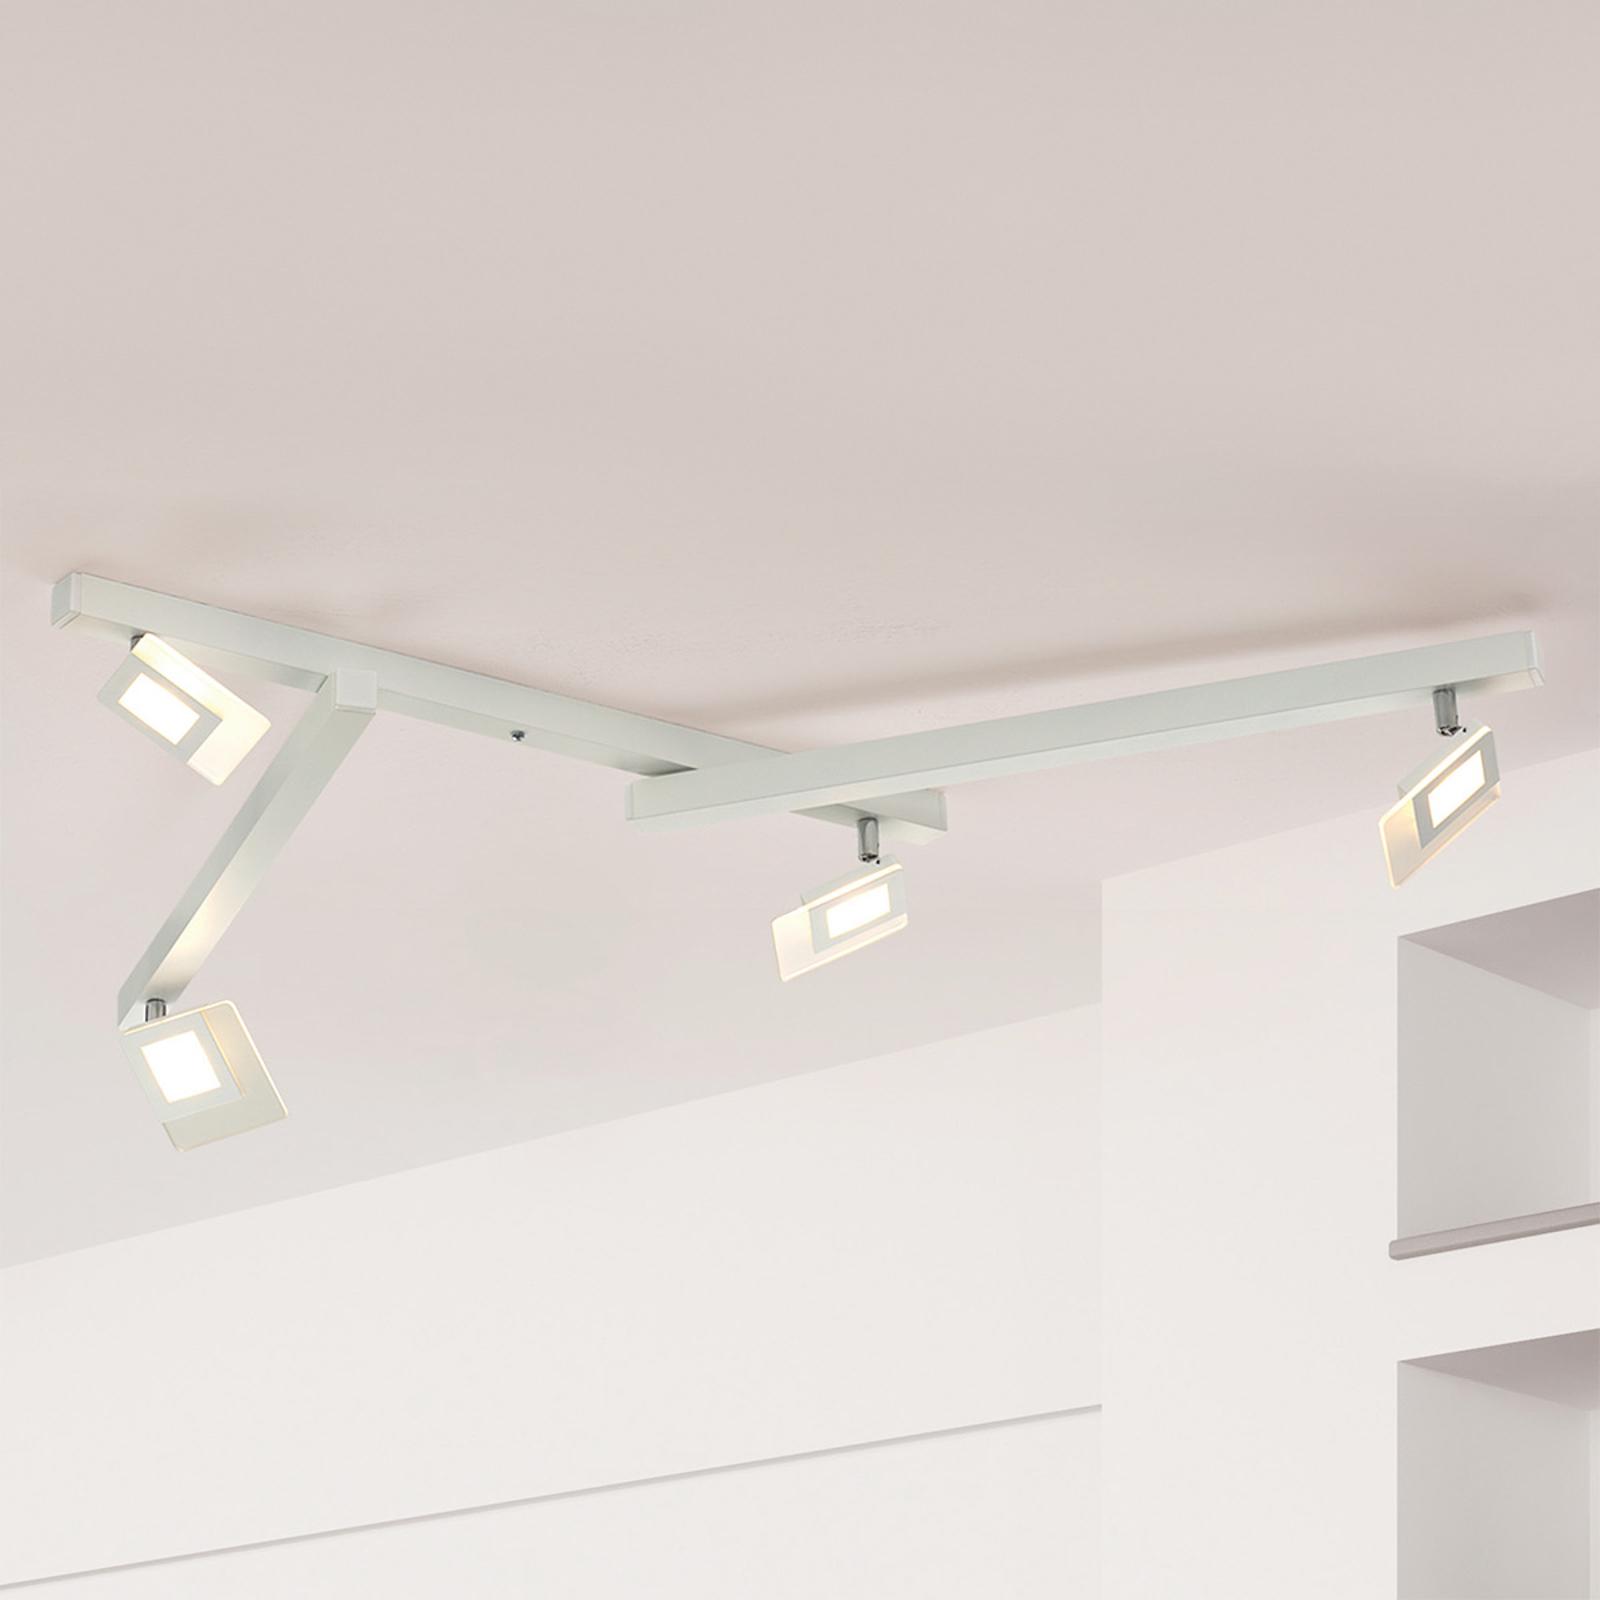 LED-taklampe Line med fem lys, hvit